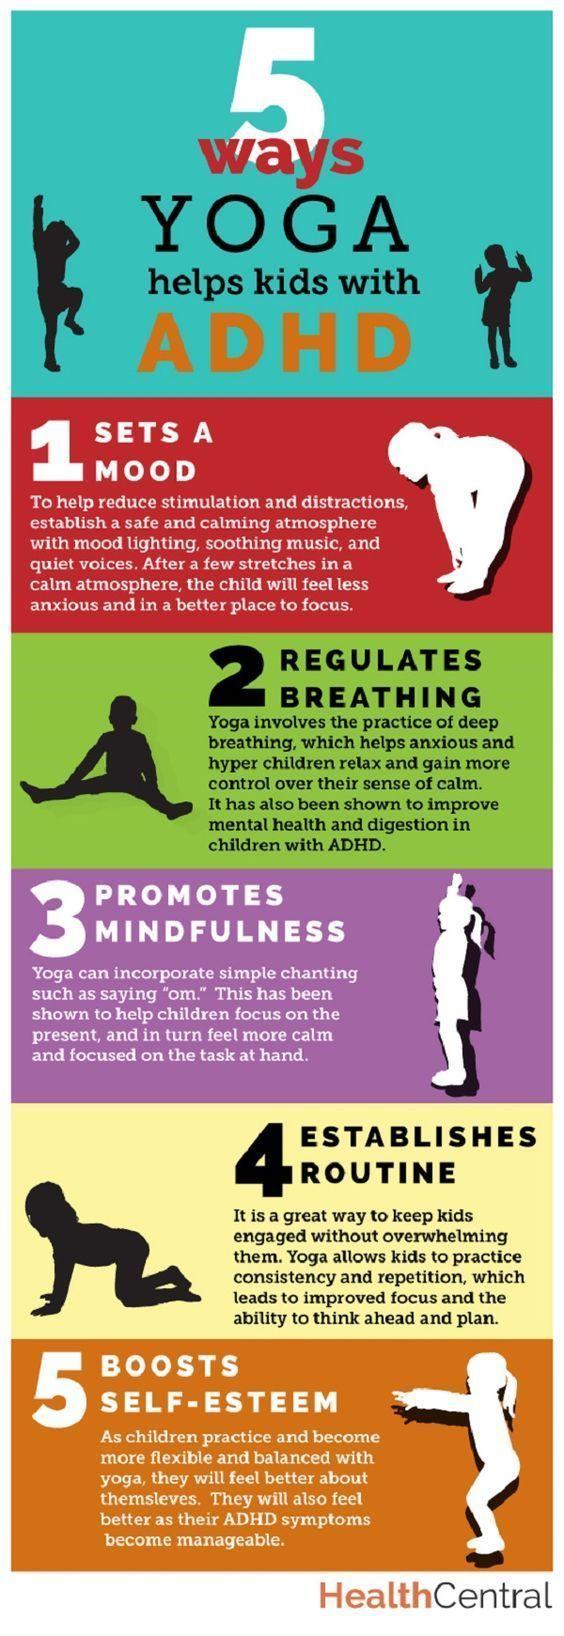 Yoga and ADHD